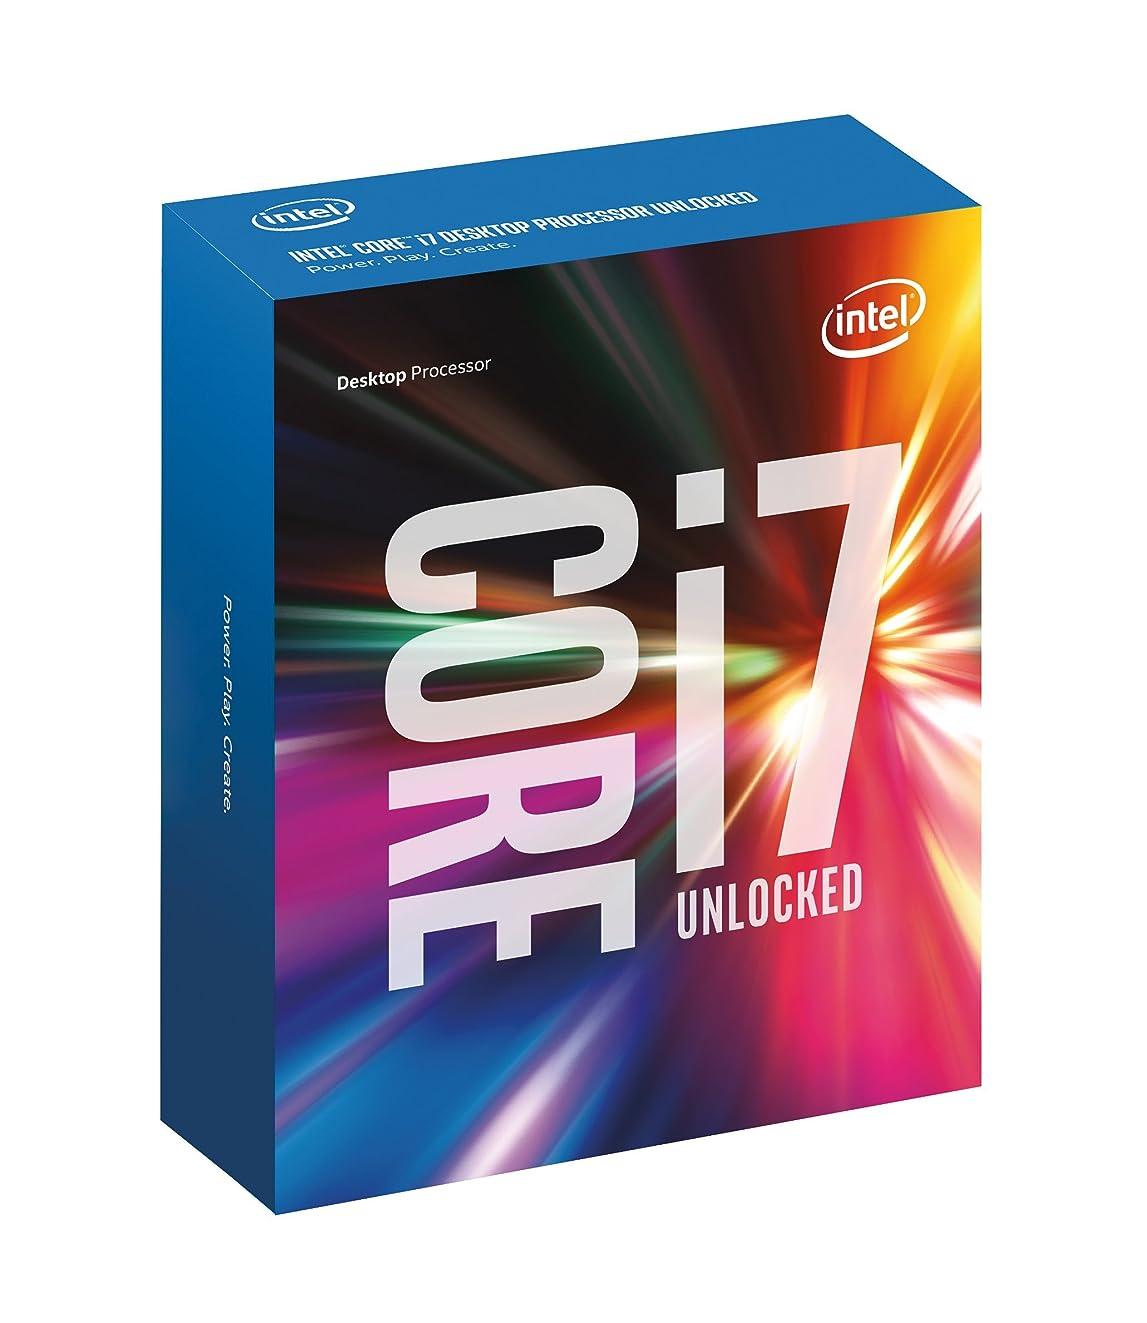 Intel Core i7 6700K 4.00 GHz Unlocked Quad Core Skylake Desktop Processor, Socket LGA 1151 [BX80662I76700K]